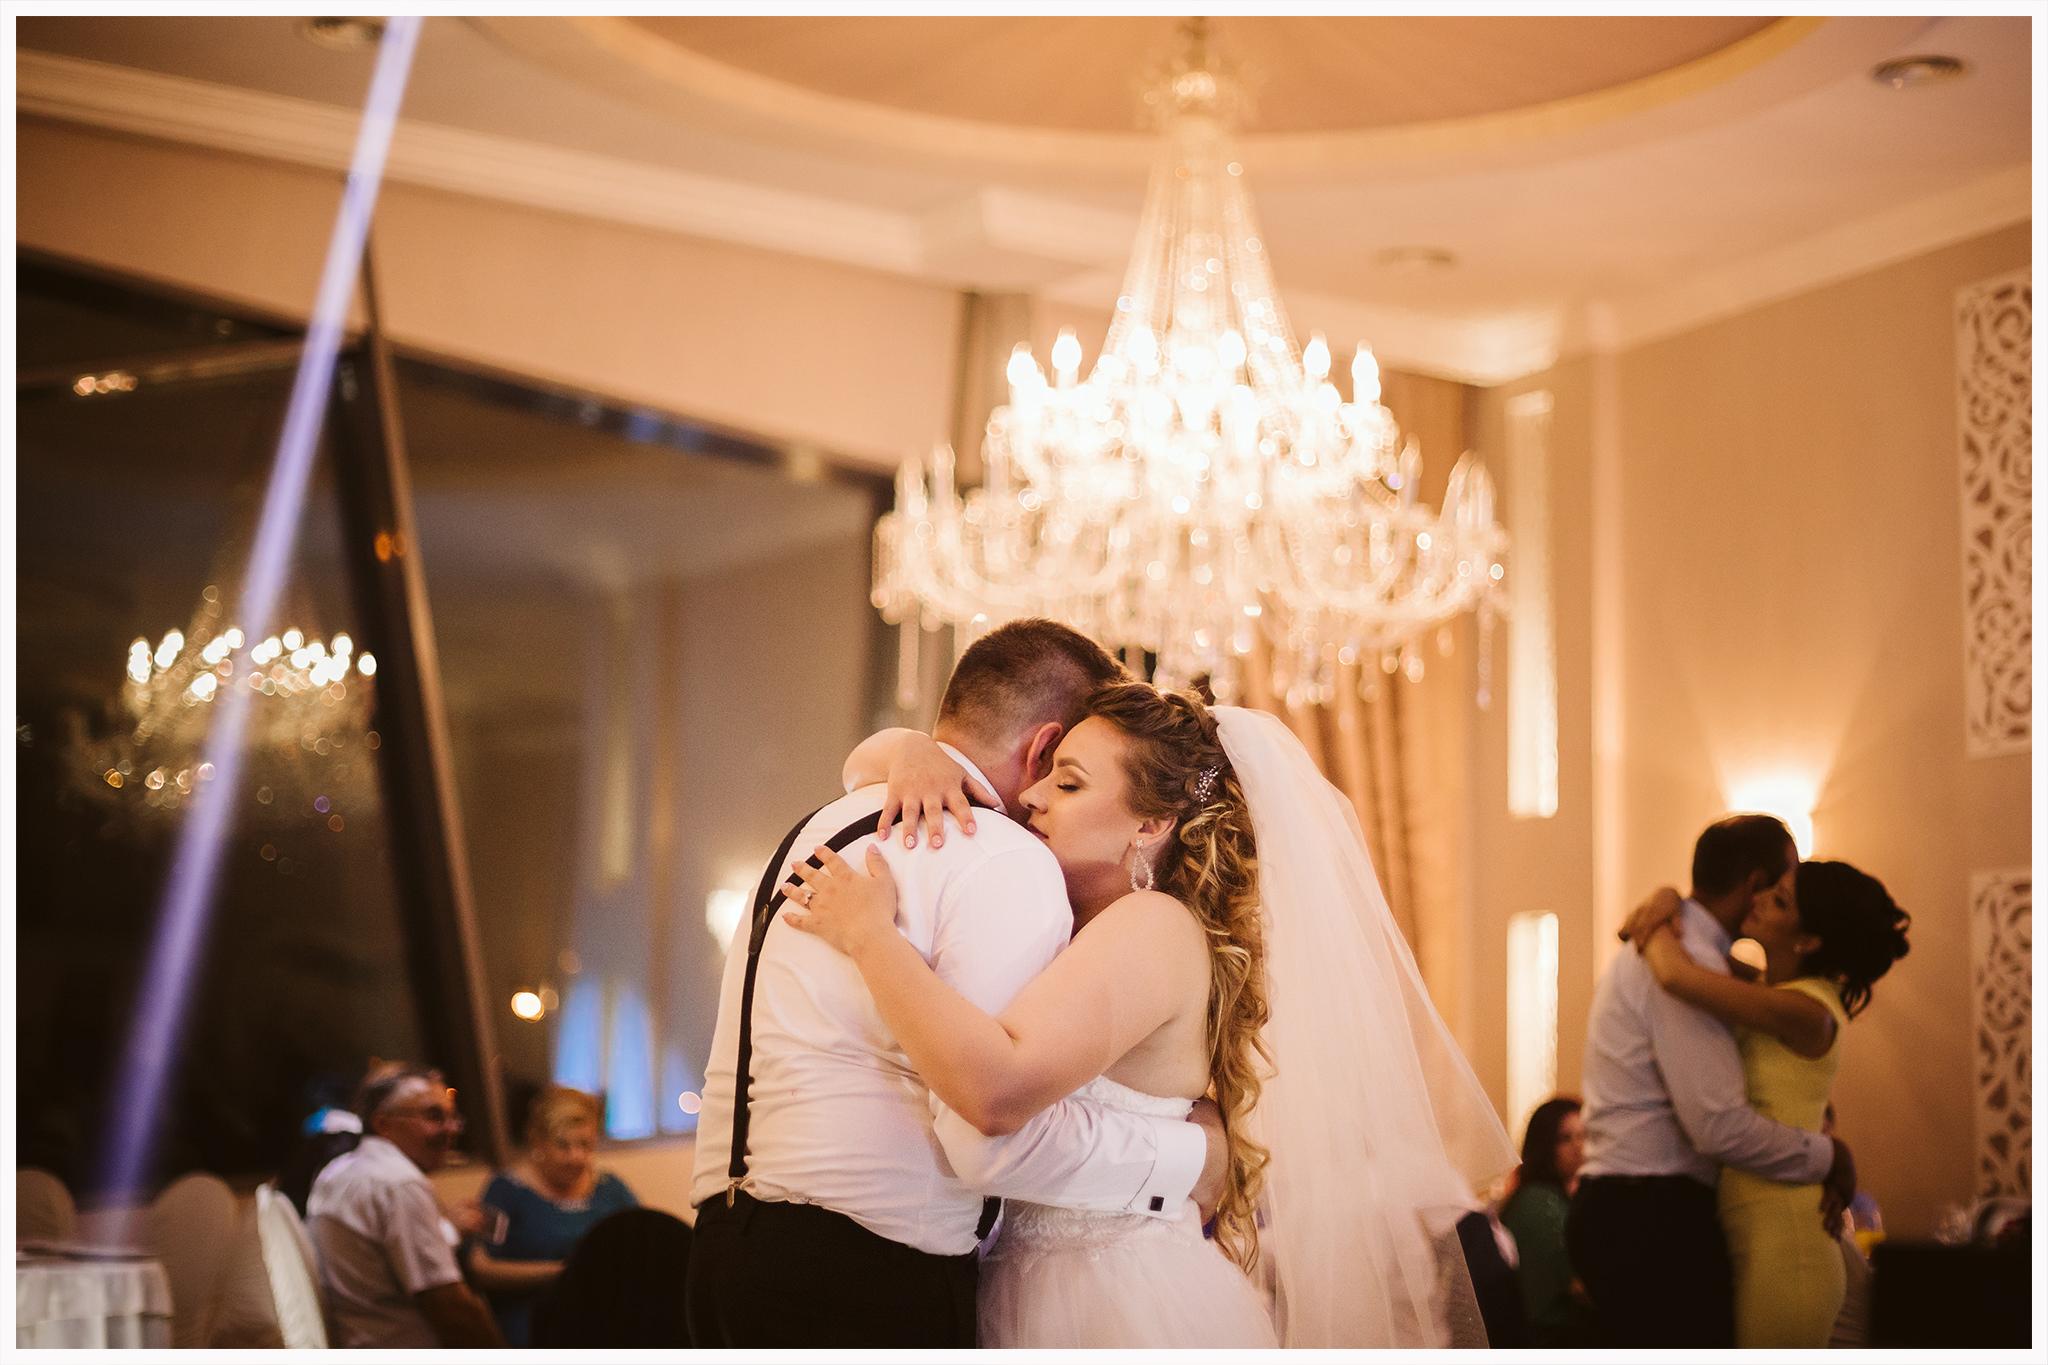 www.dreamsanddreamers.com-fotograf-nunta-timisoara-diana-sebastian-864.jpg